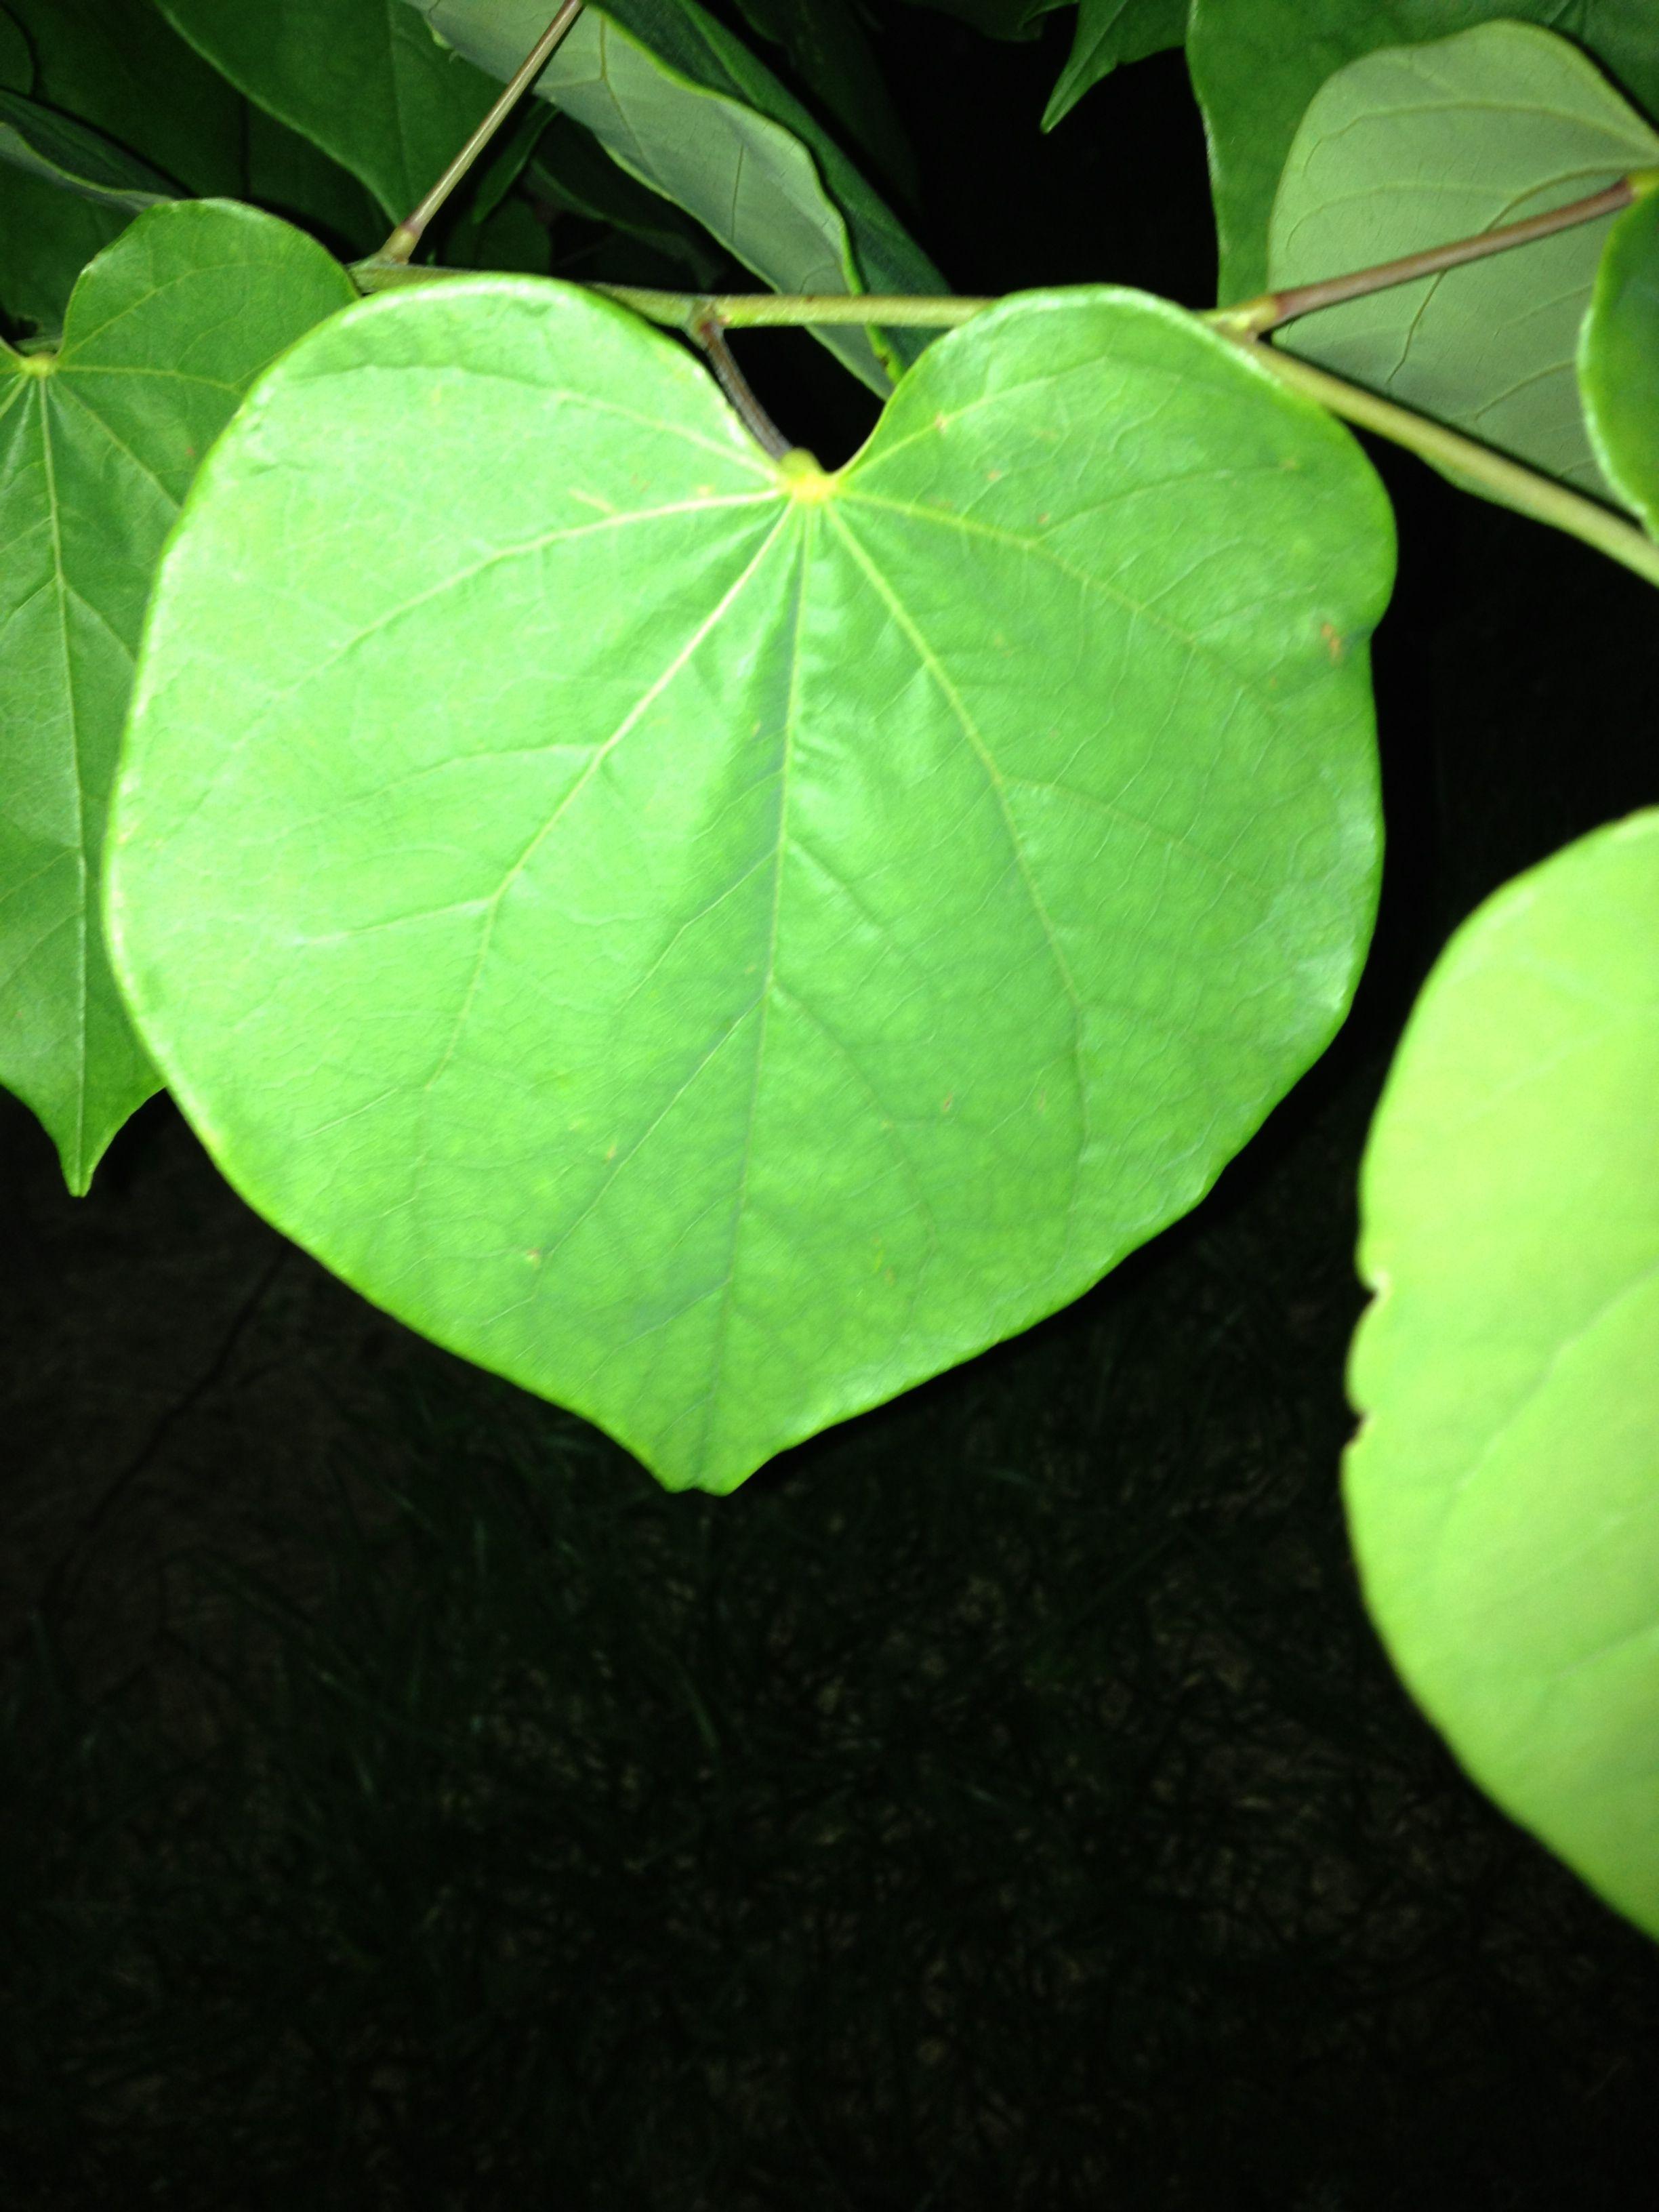 I Love The Heart Shaped Leaves Of The Redbud Tree Redbud Tree